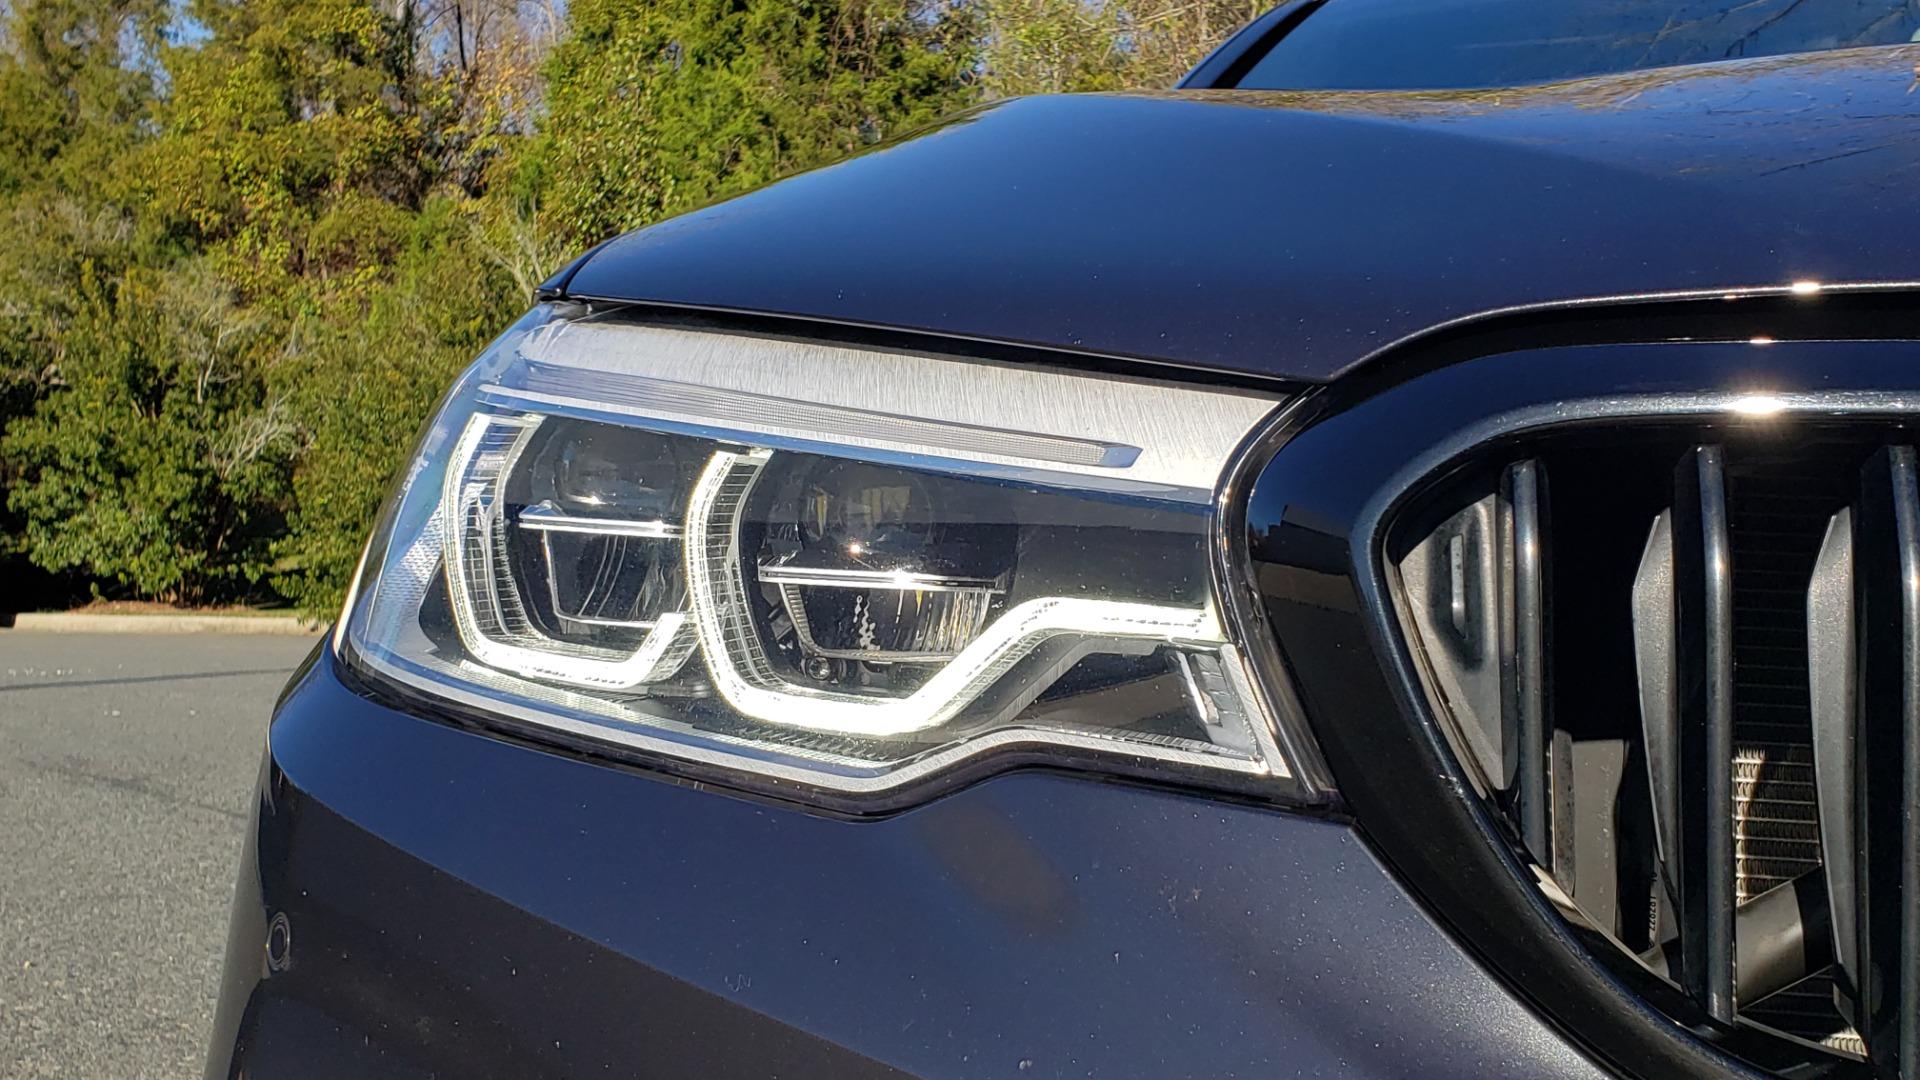 Used 2018 BMW 5 SERIES 540I M-SPORT / DRVR ASST / EXEC PKG / NAV / SUNROOF / HUD / REARVIEW for sale Sold at Formula Imports in Charlotte NC 28227 19